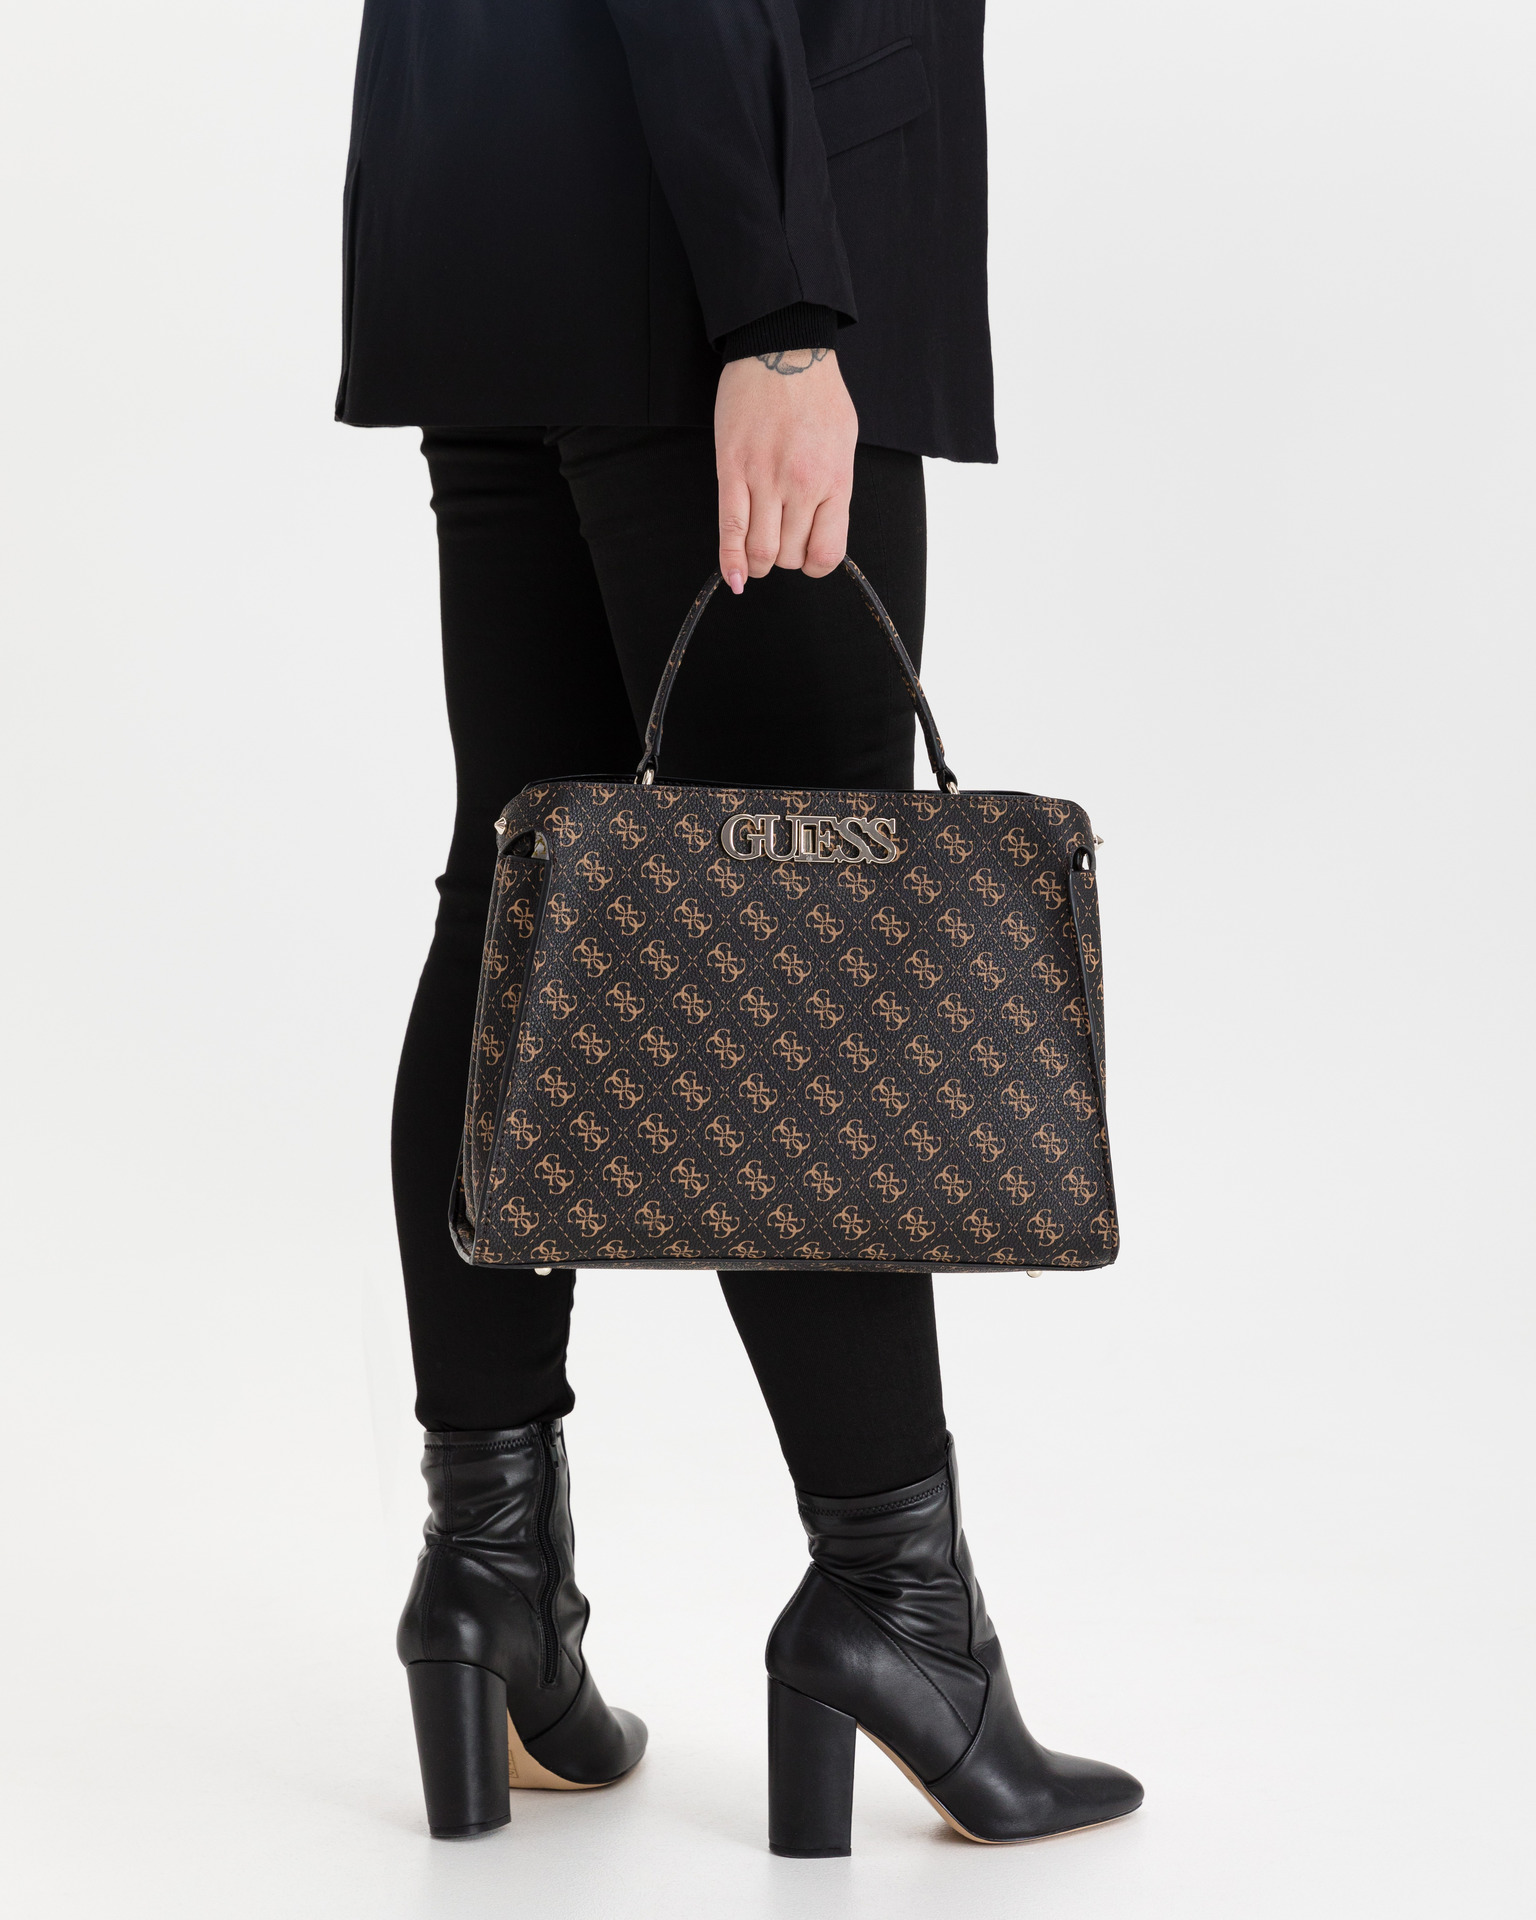 Guess brown handbag Uptown Chic Large